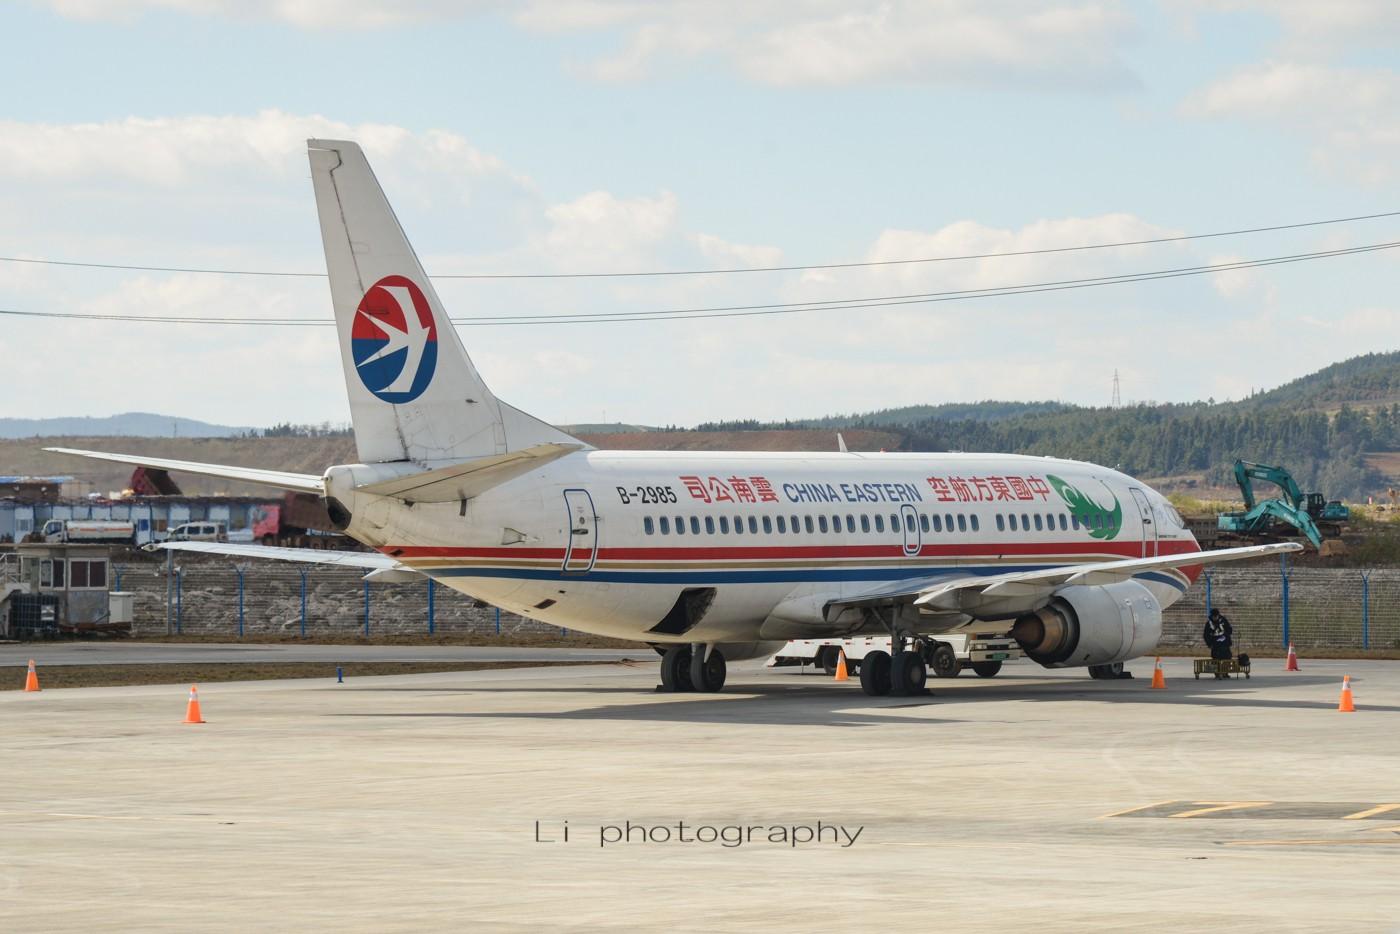 Re:[原创]【CKG打机队】发几张在昆明转机时拍的,天气让人醉啊 BOEING 737-300 B-2985 中国昆明长水国际机场机场